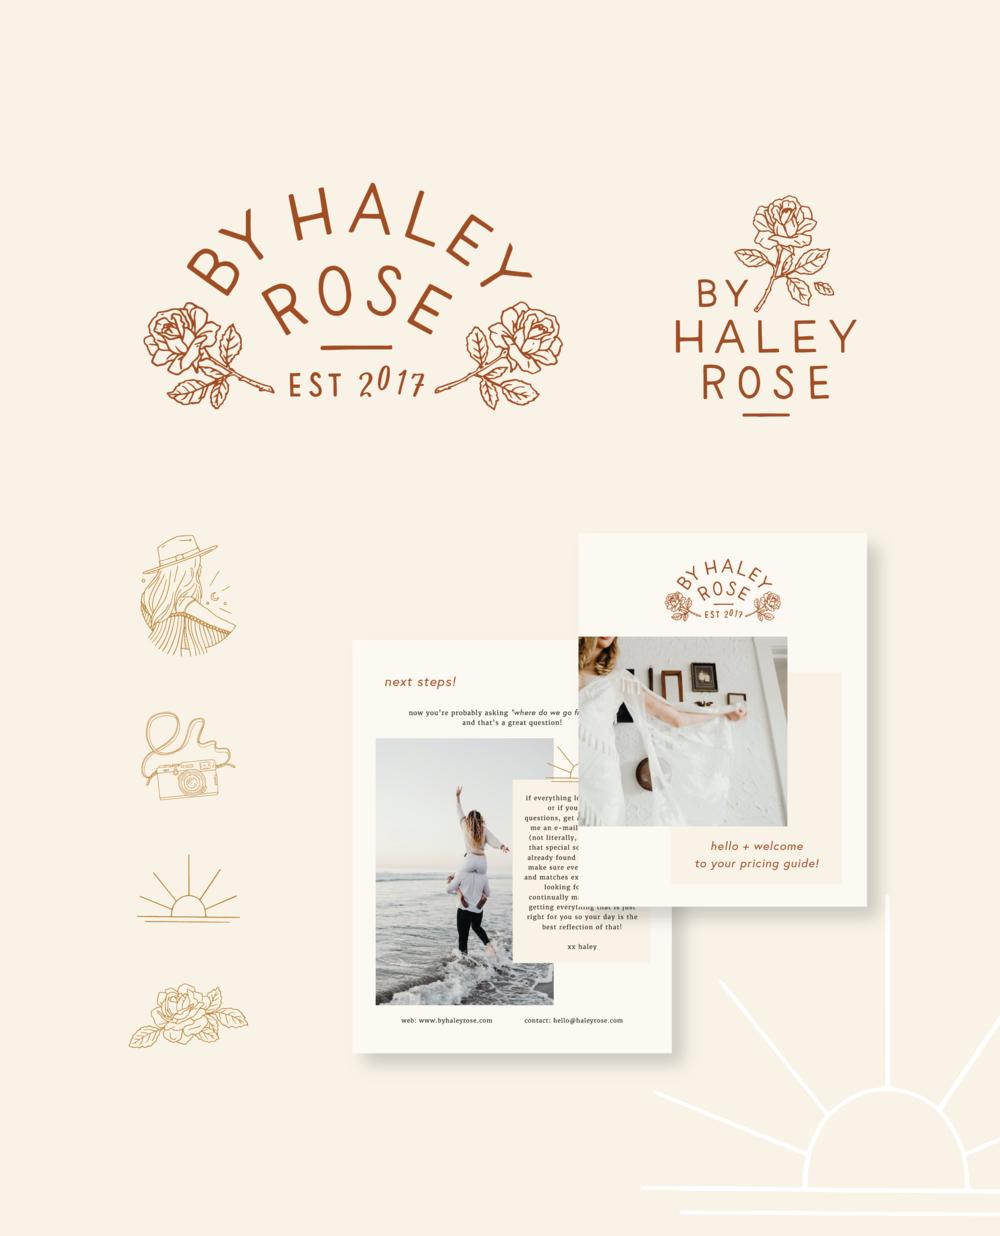 Haley Sieben - Thoughts on Chez Nunez